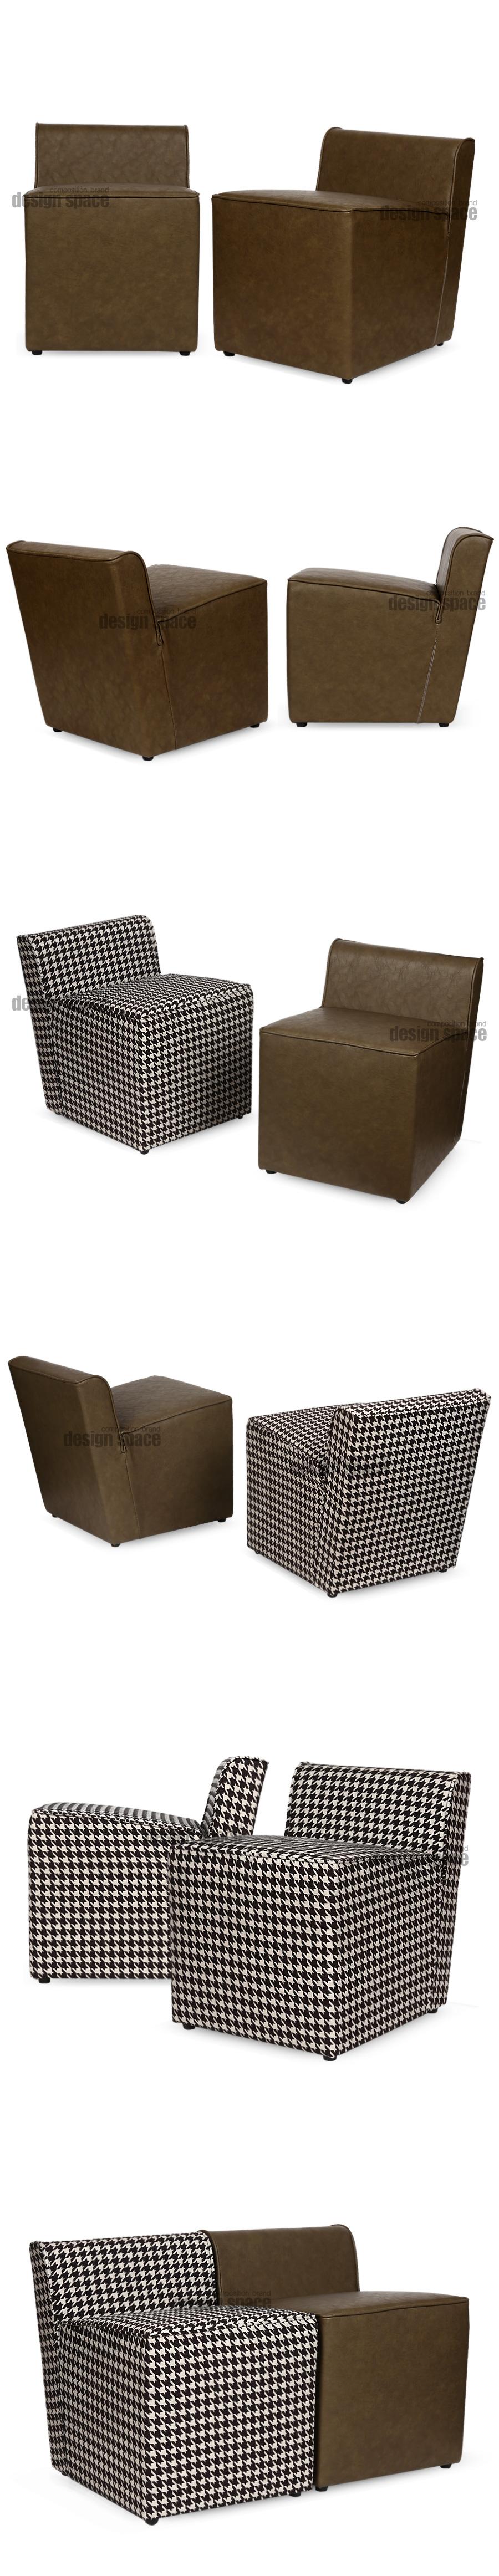 teenie-sofa_02.jpg